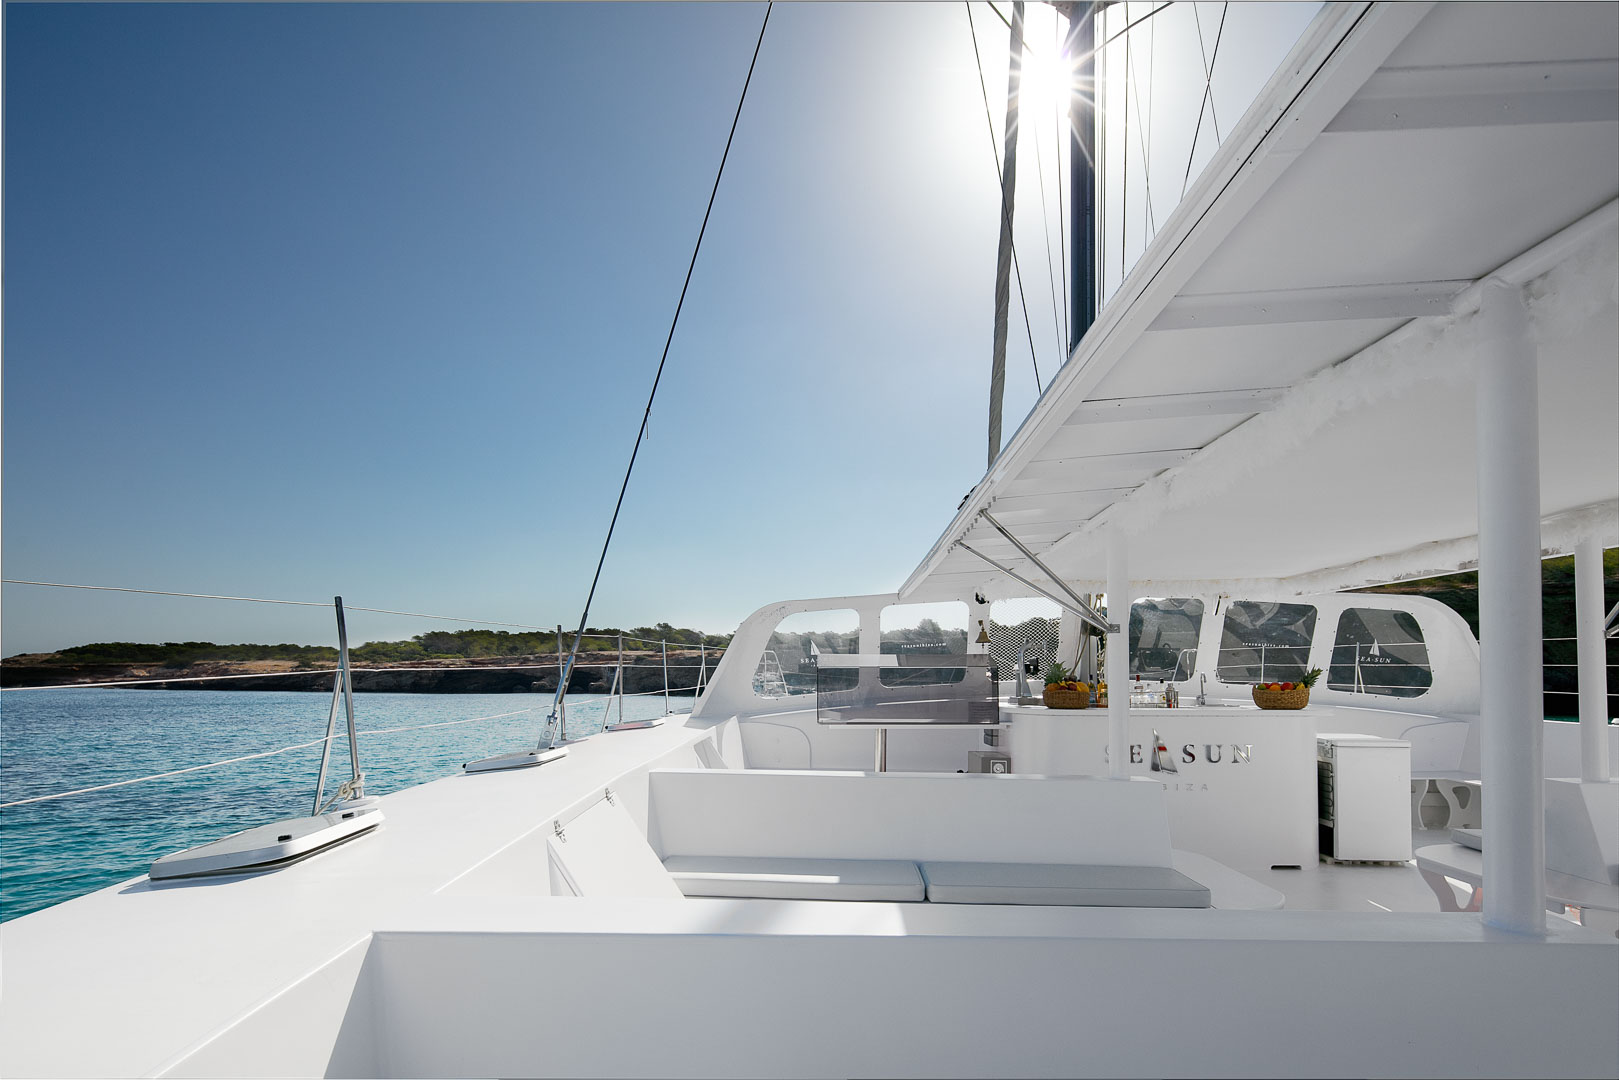 fotografia profesional publicitaria del exterior izquierdo de un catamaran para pasajeros en ibiza